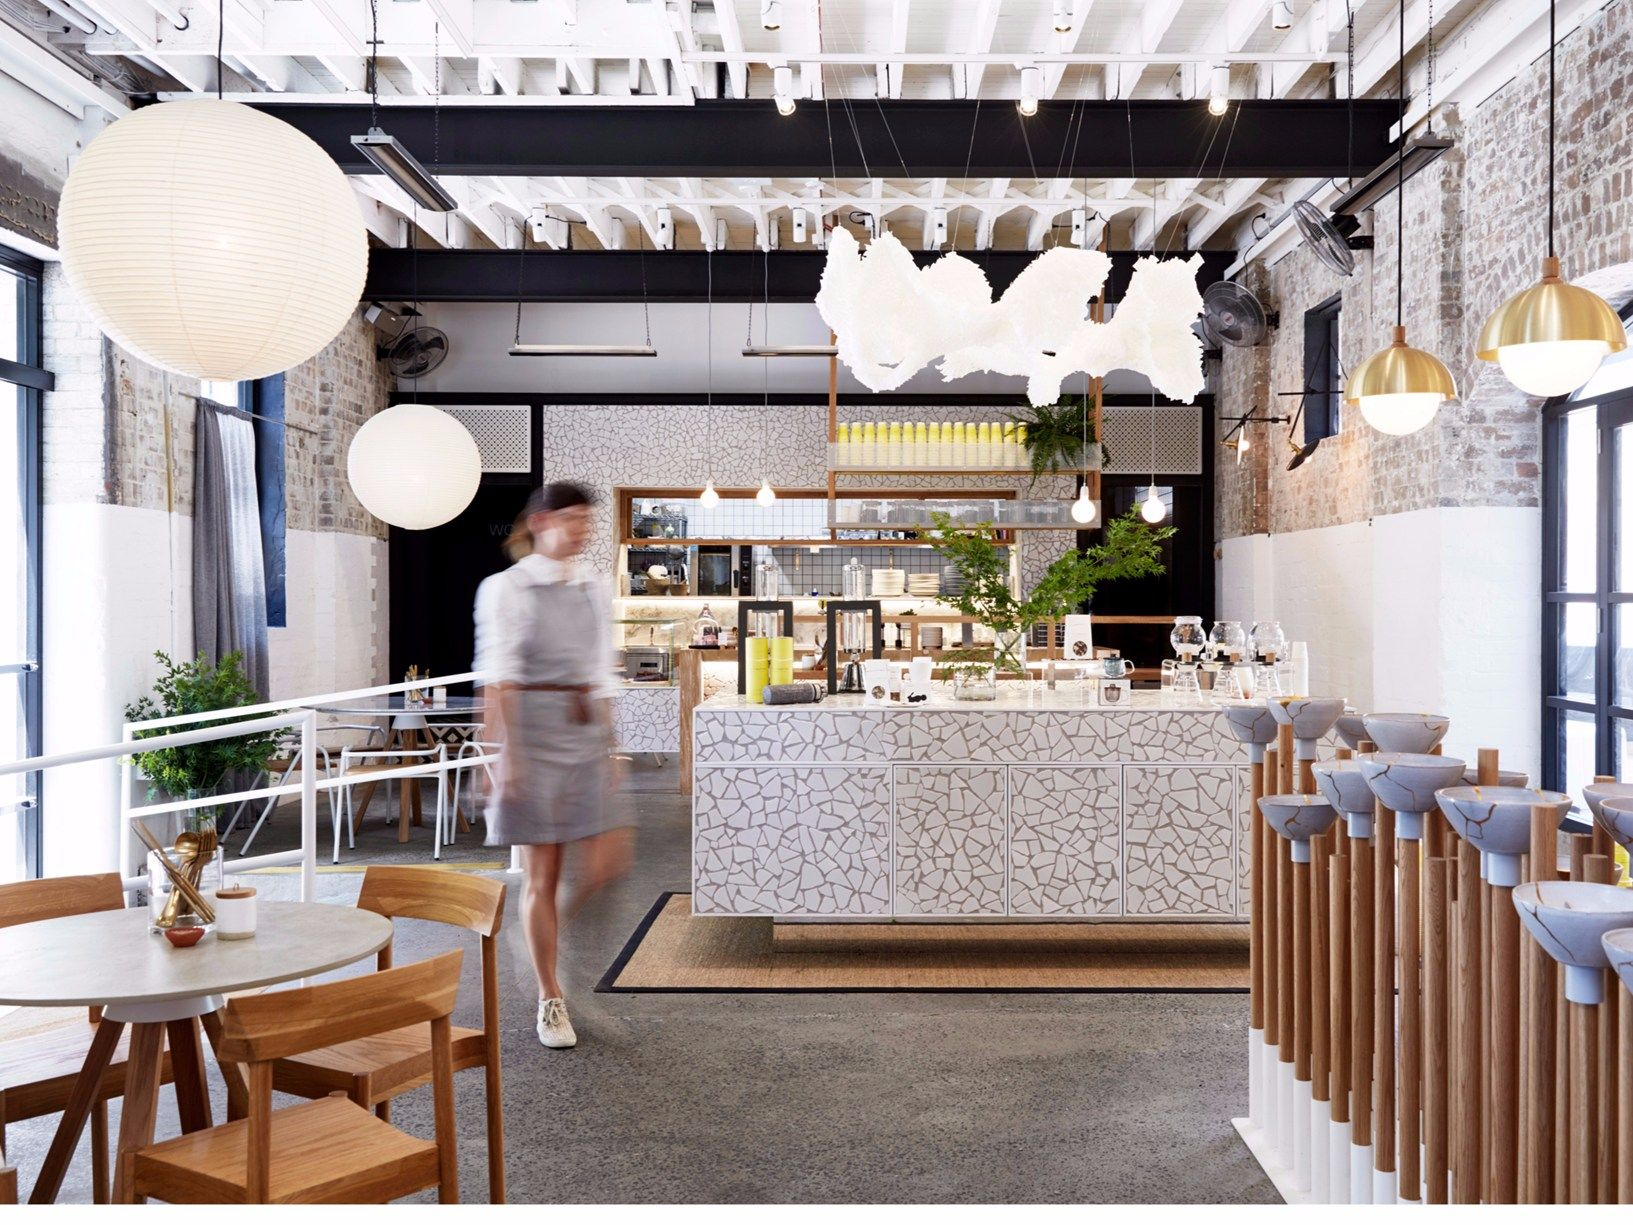 The Rabbit Hole: da ex sito industriale a nuova tea house